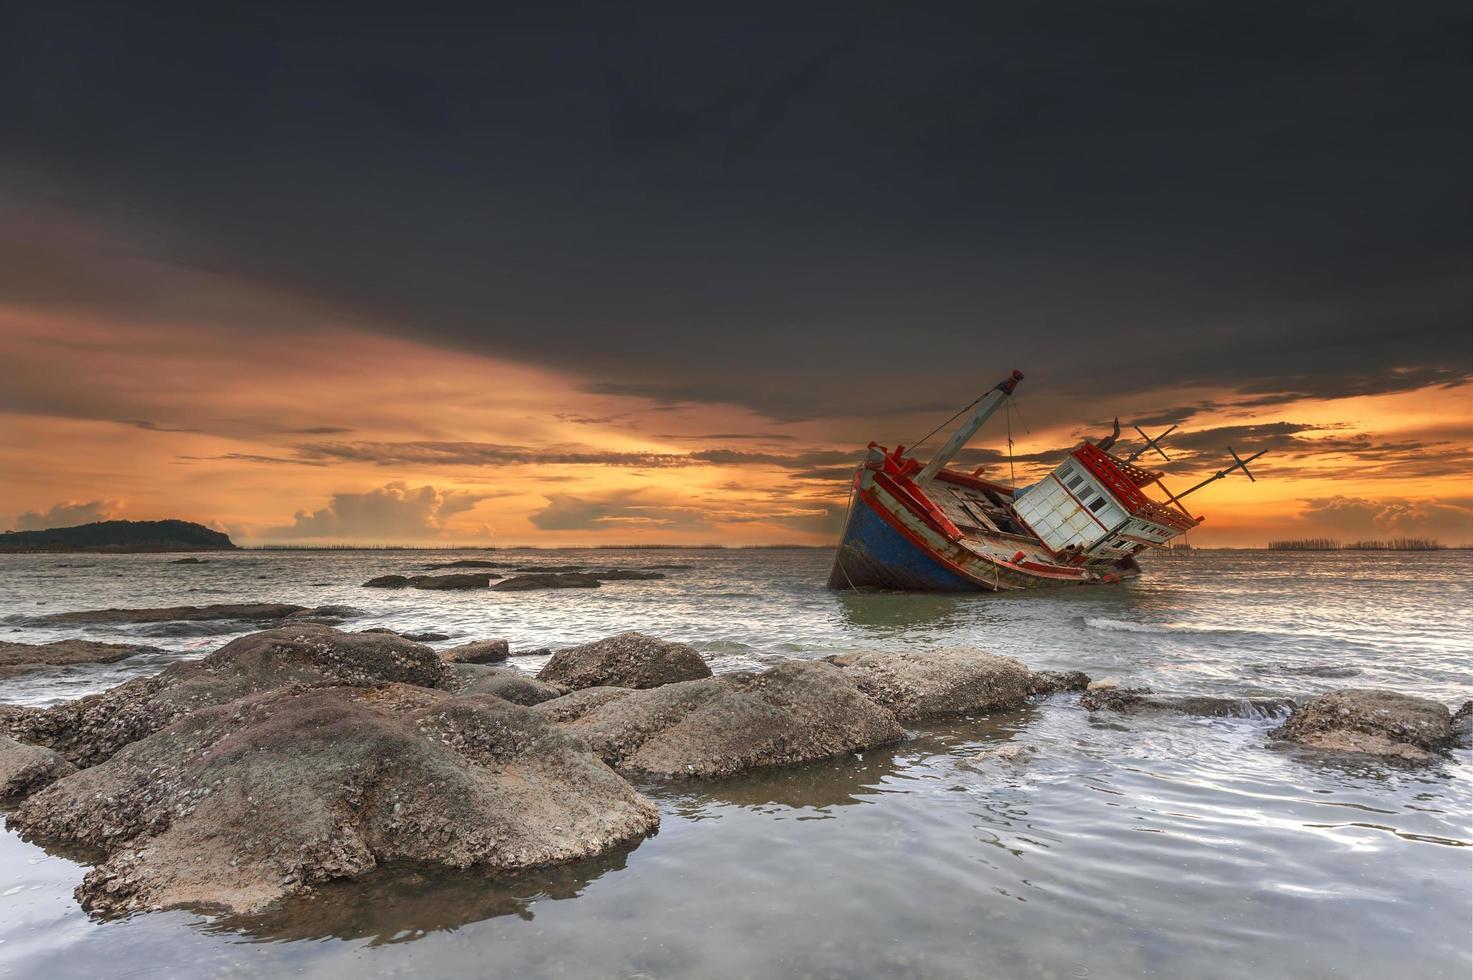 naufragio en chonburi, tailandia foto